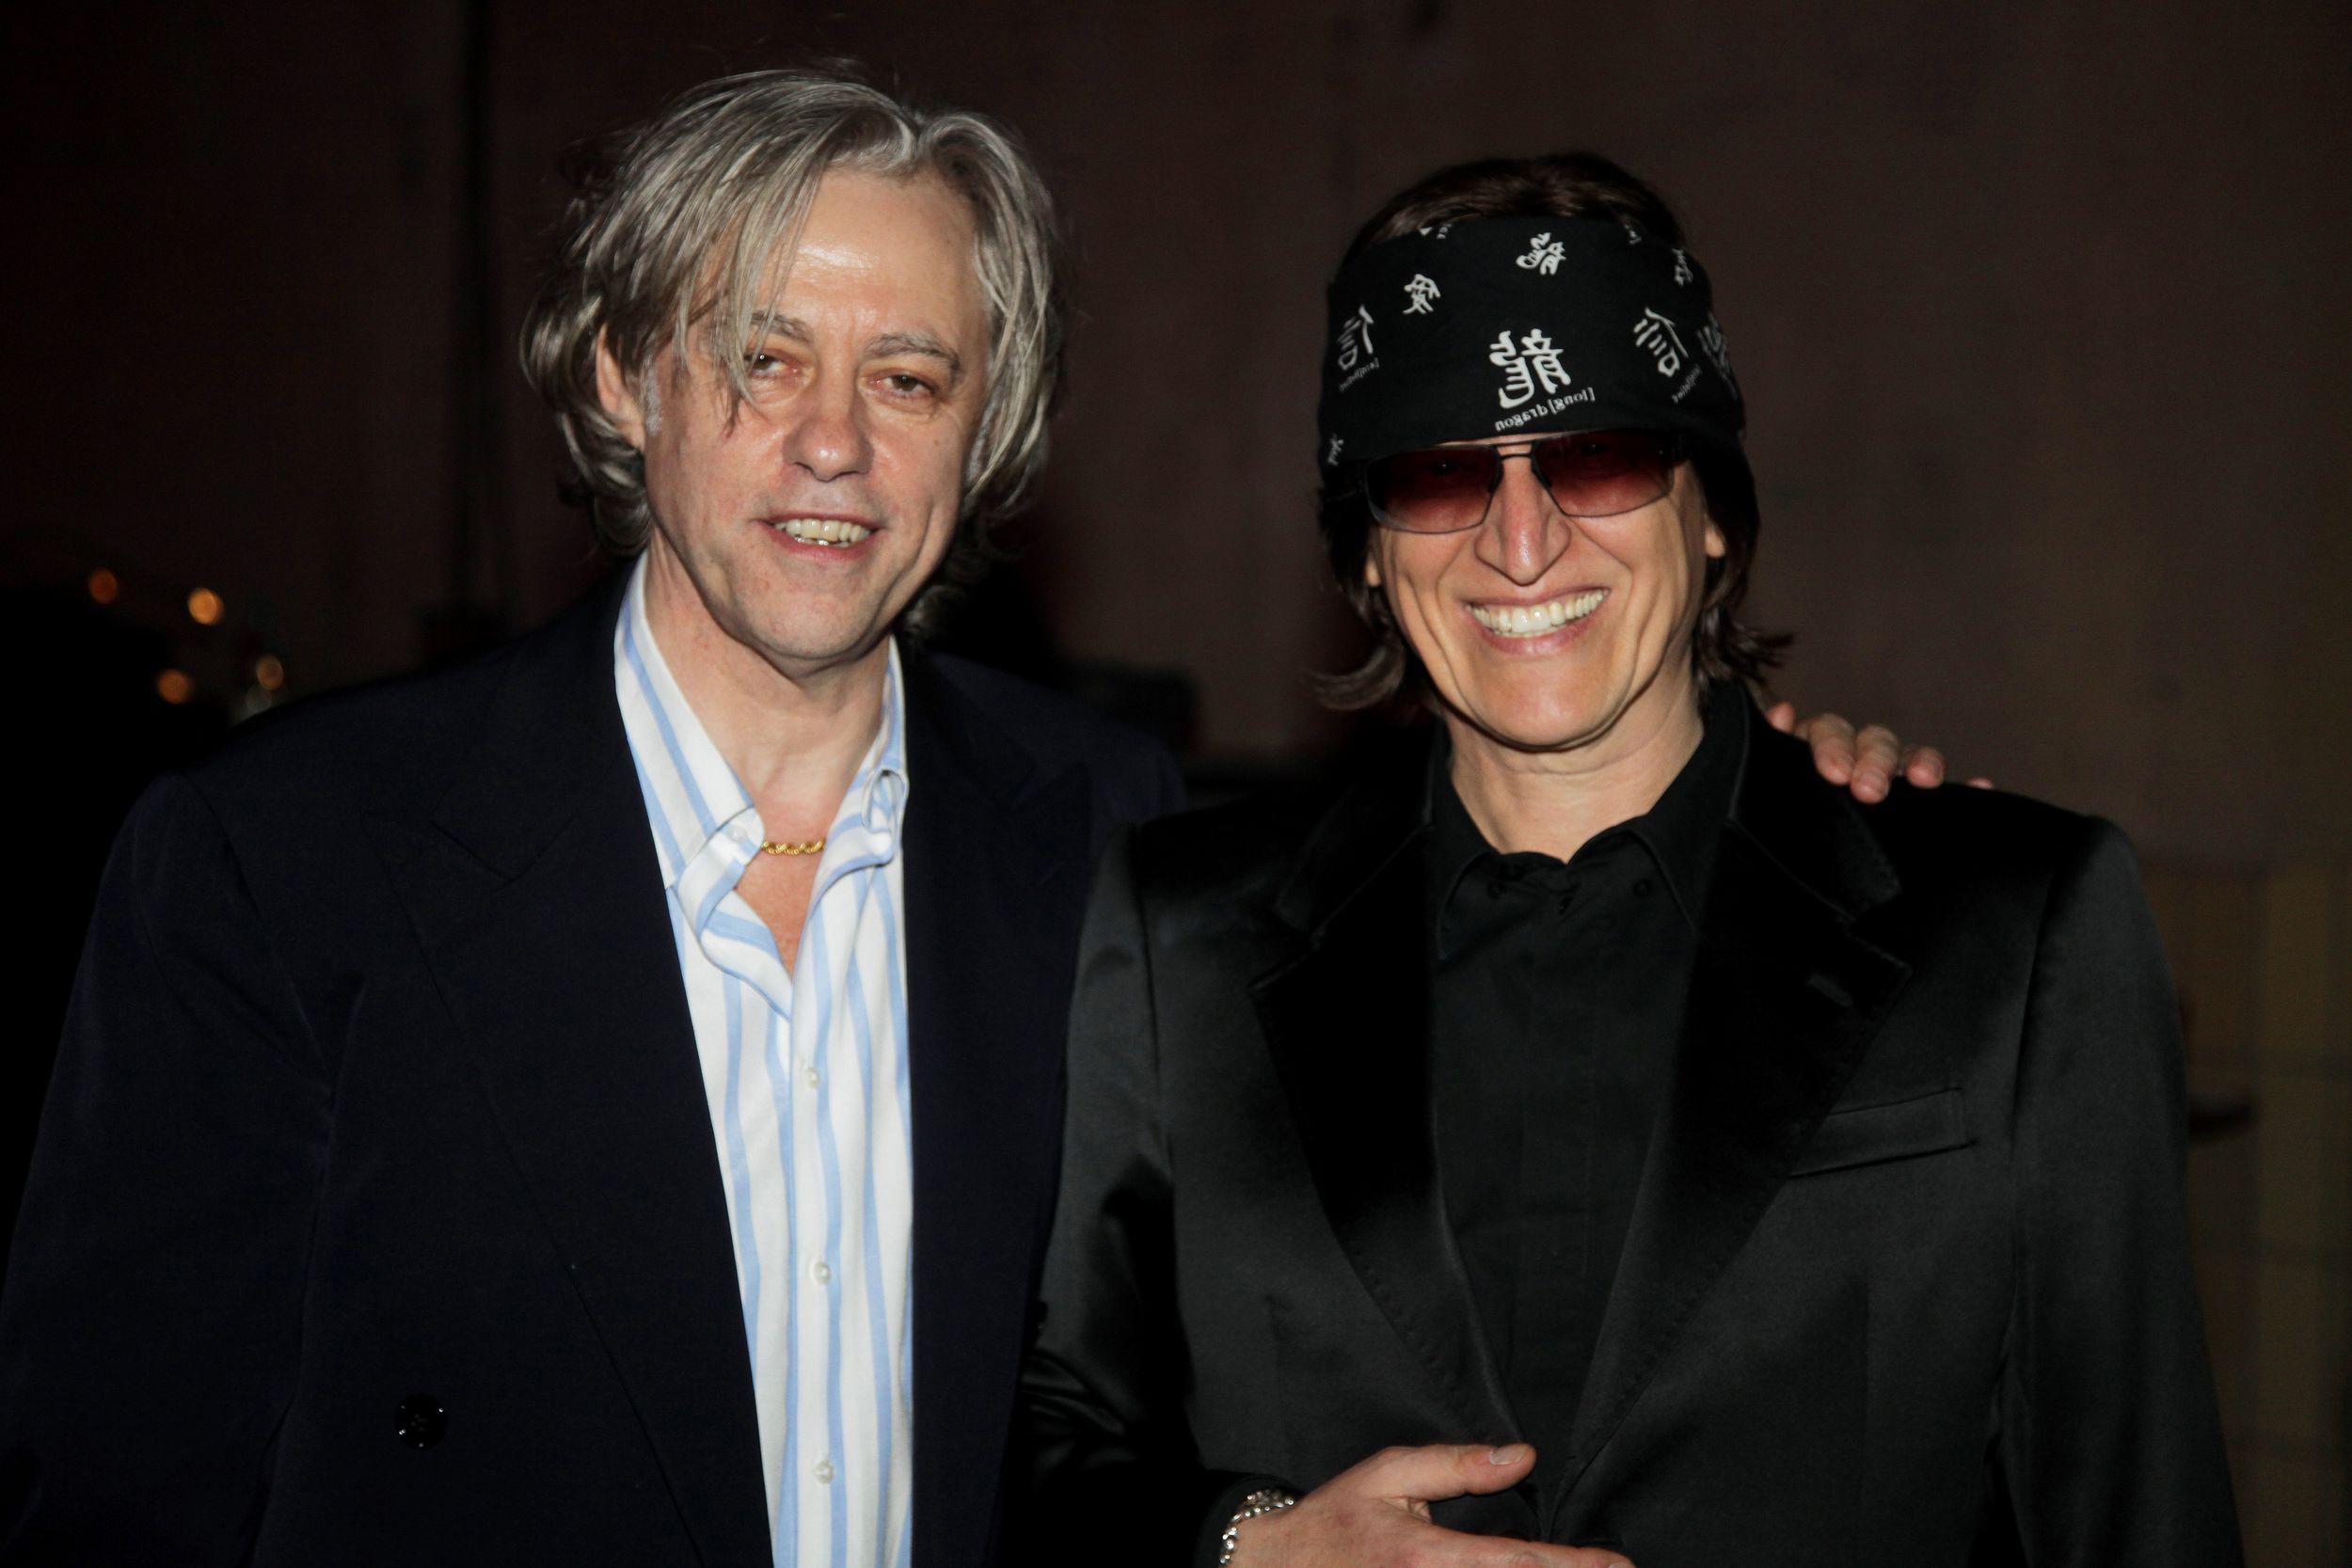 Sir Bob Geldof and Gottfried Helnwein, Steiger Awards 2009 (Music and Art), Jahrhunderthalle Bochum. foto: steiger award